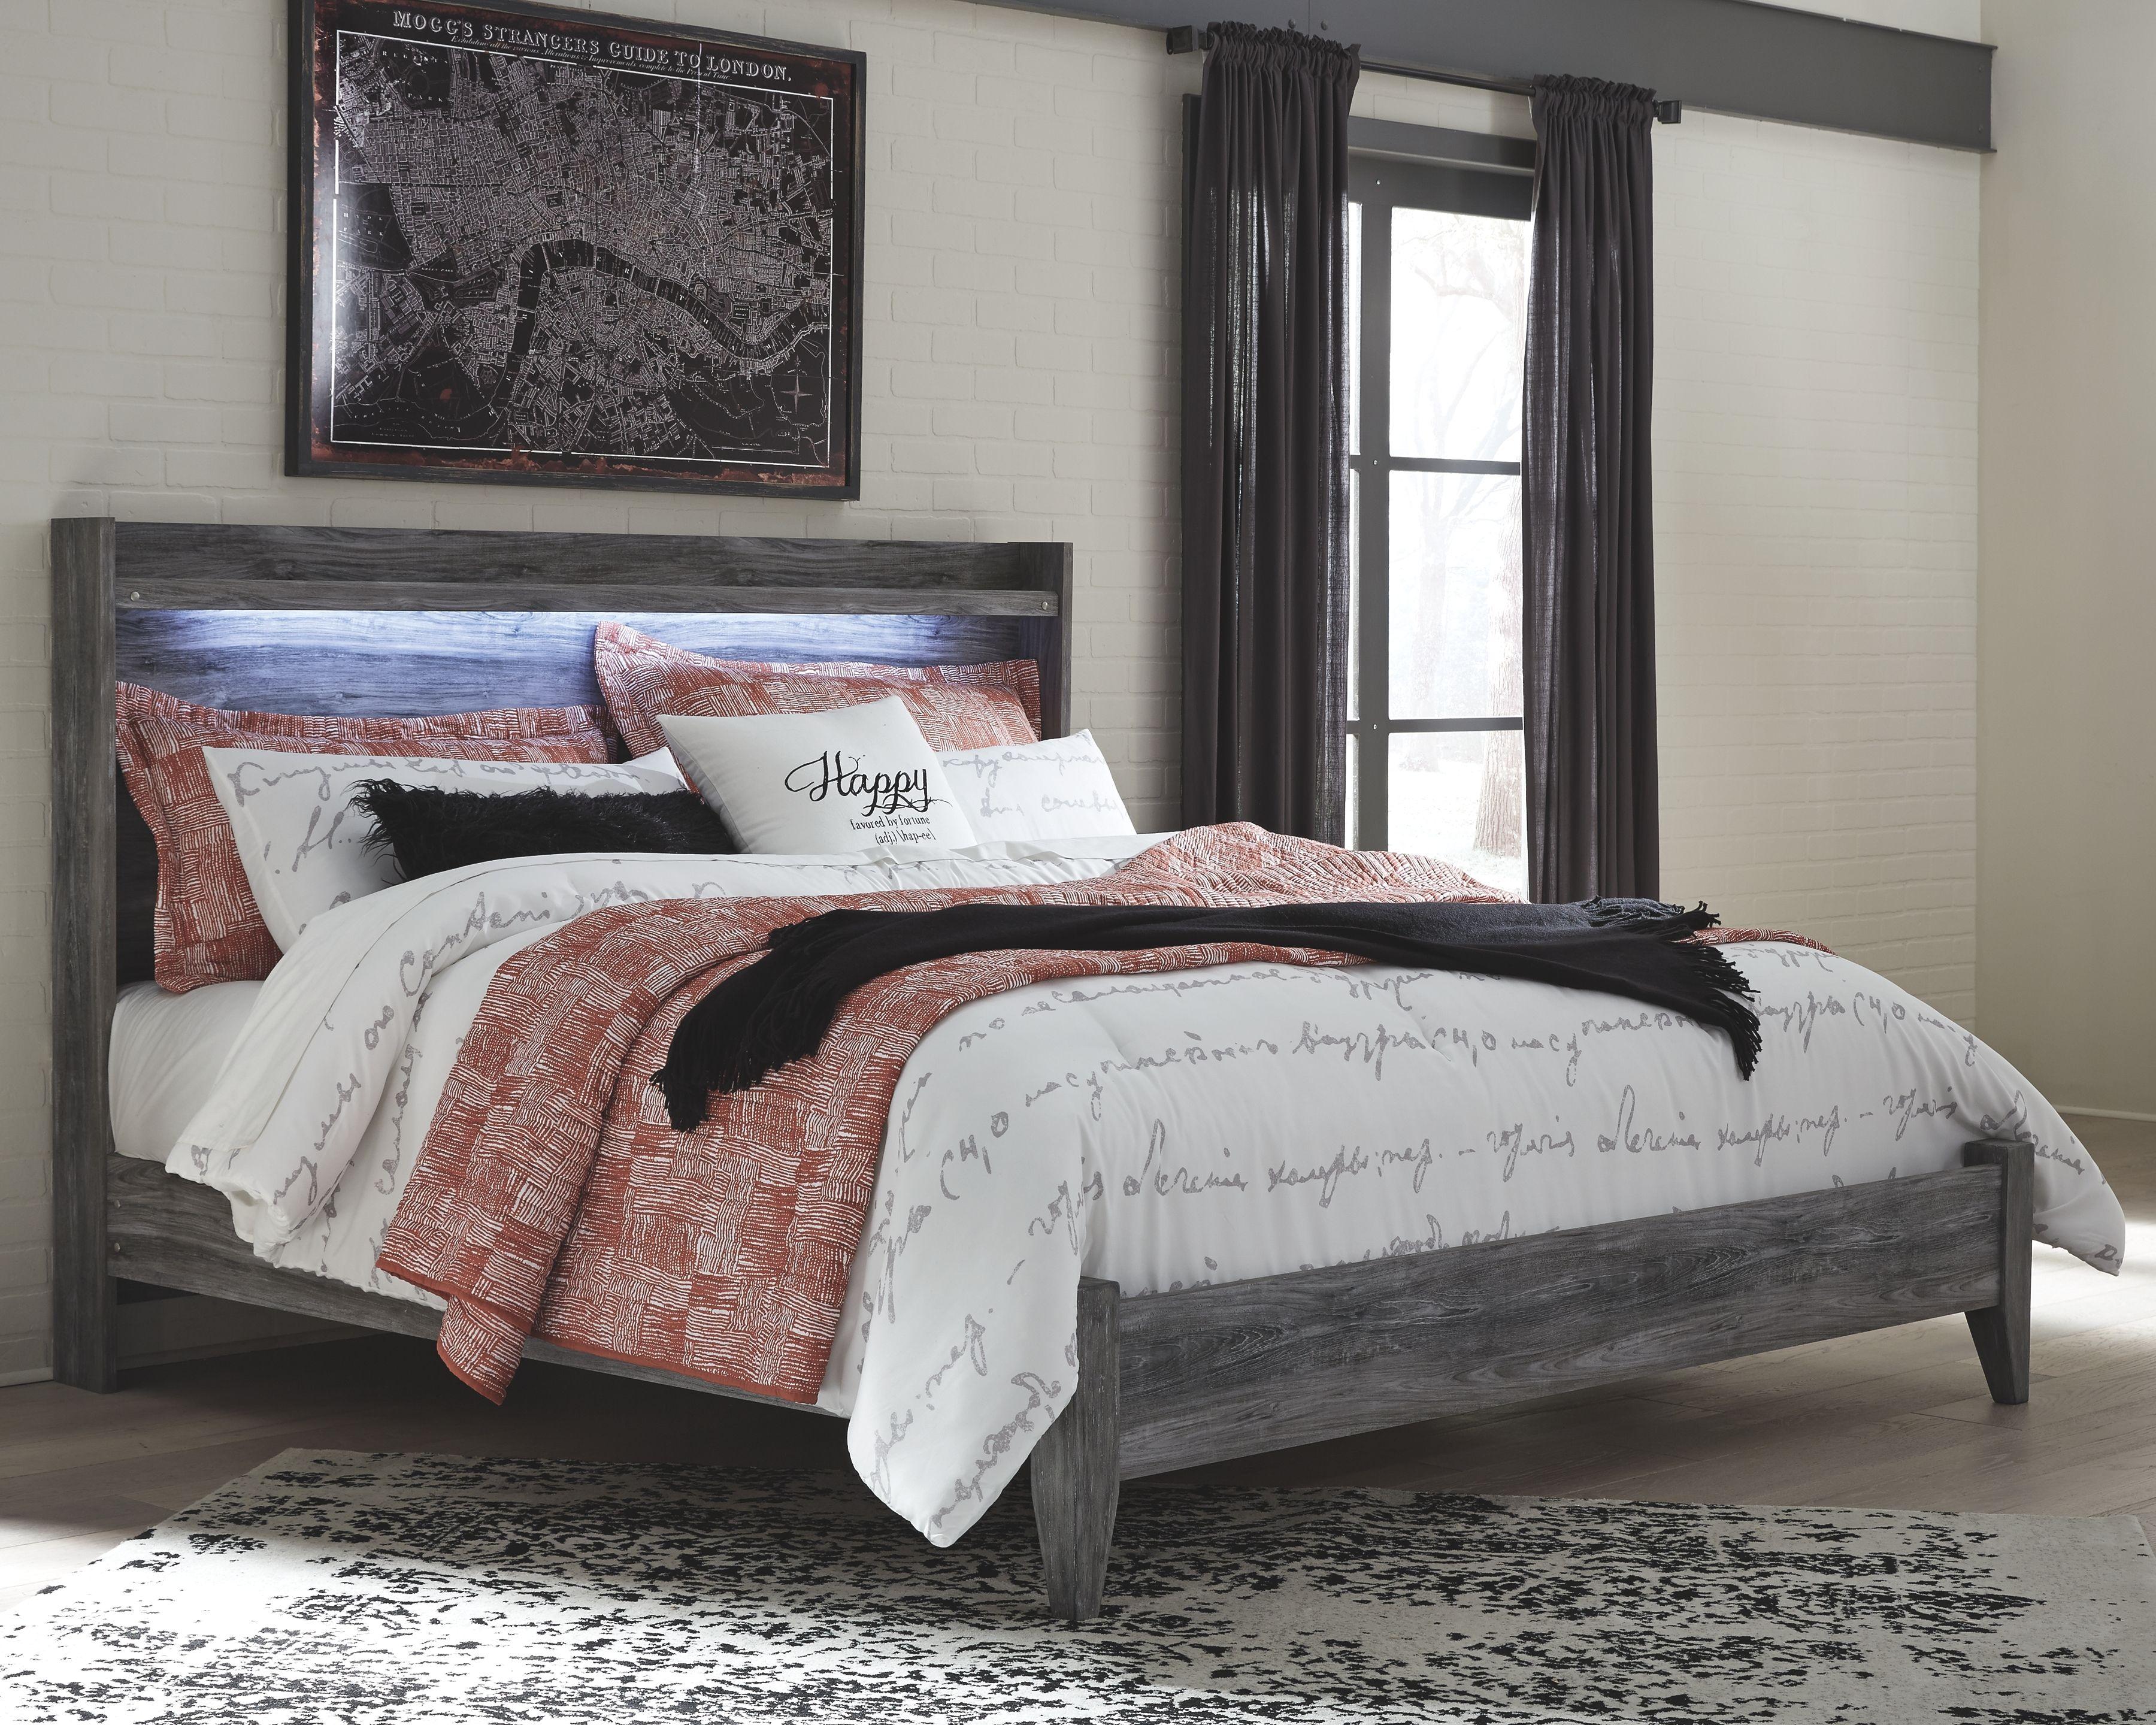 Baystorm King Panel Bed King storage bed